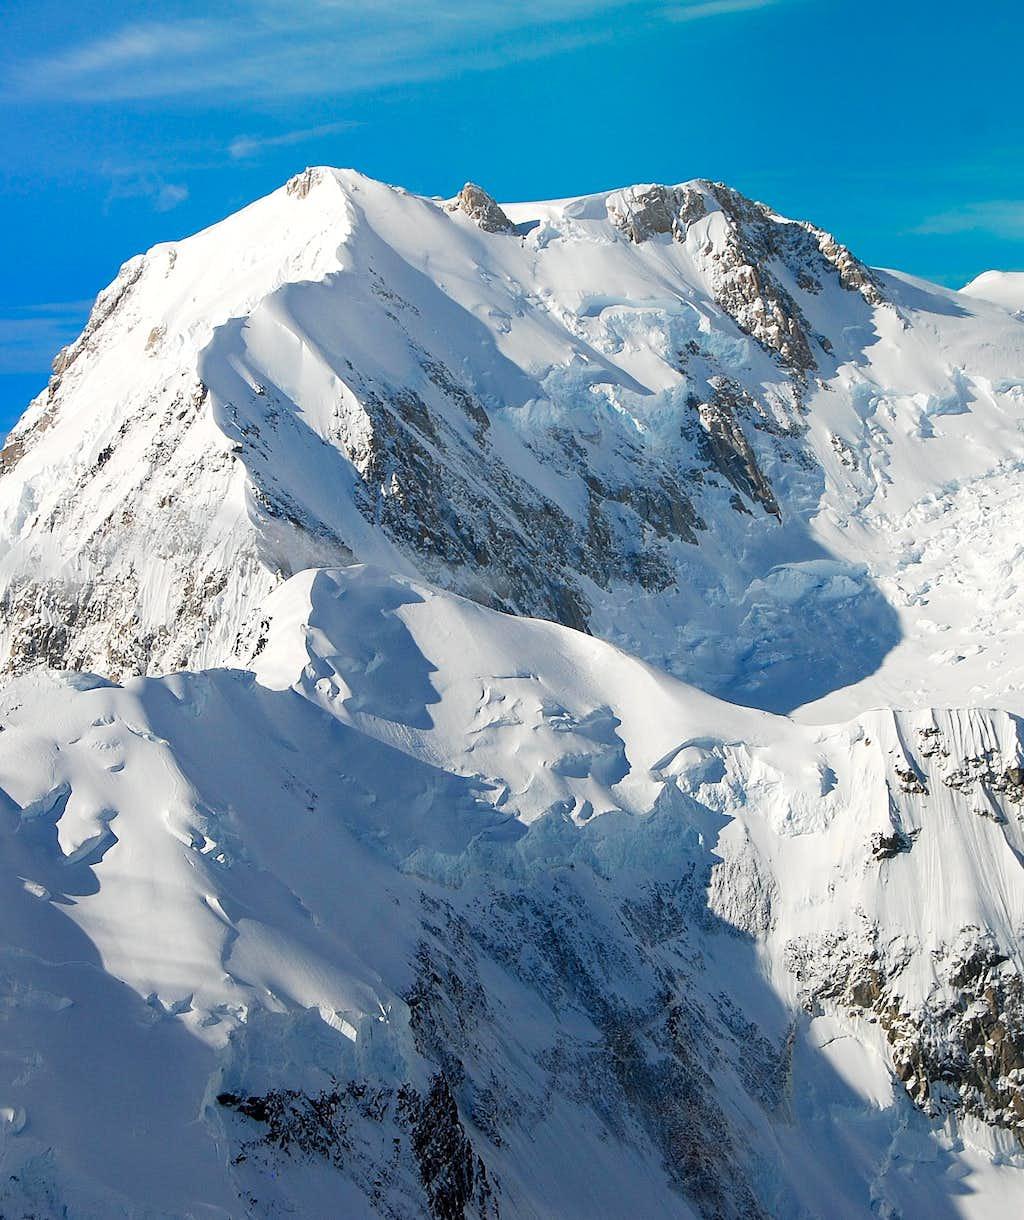 TRALEIKA COL-MOUNT McKINLEY (20,320')